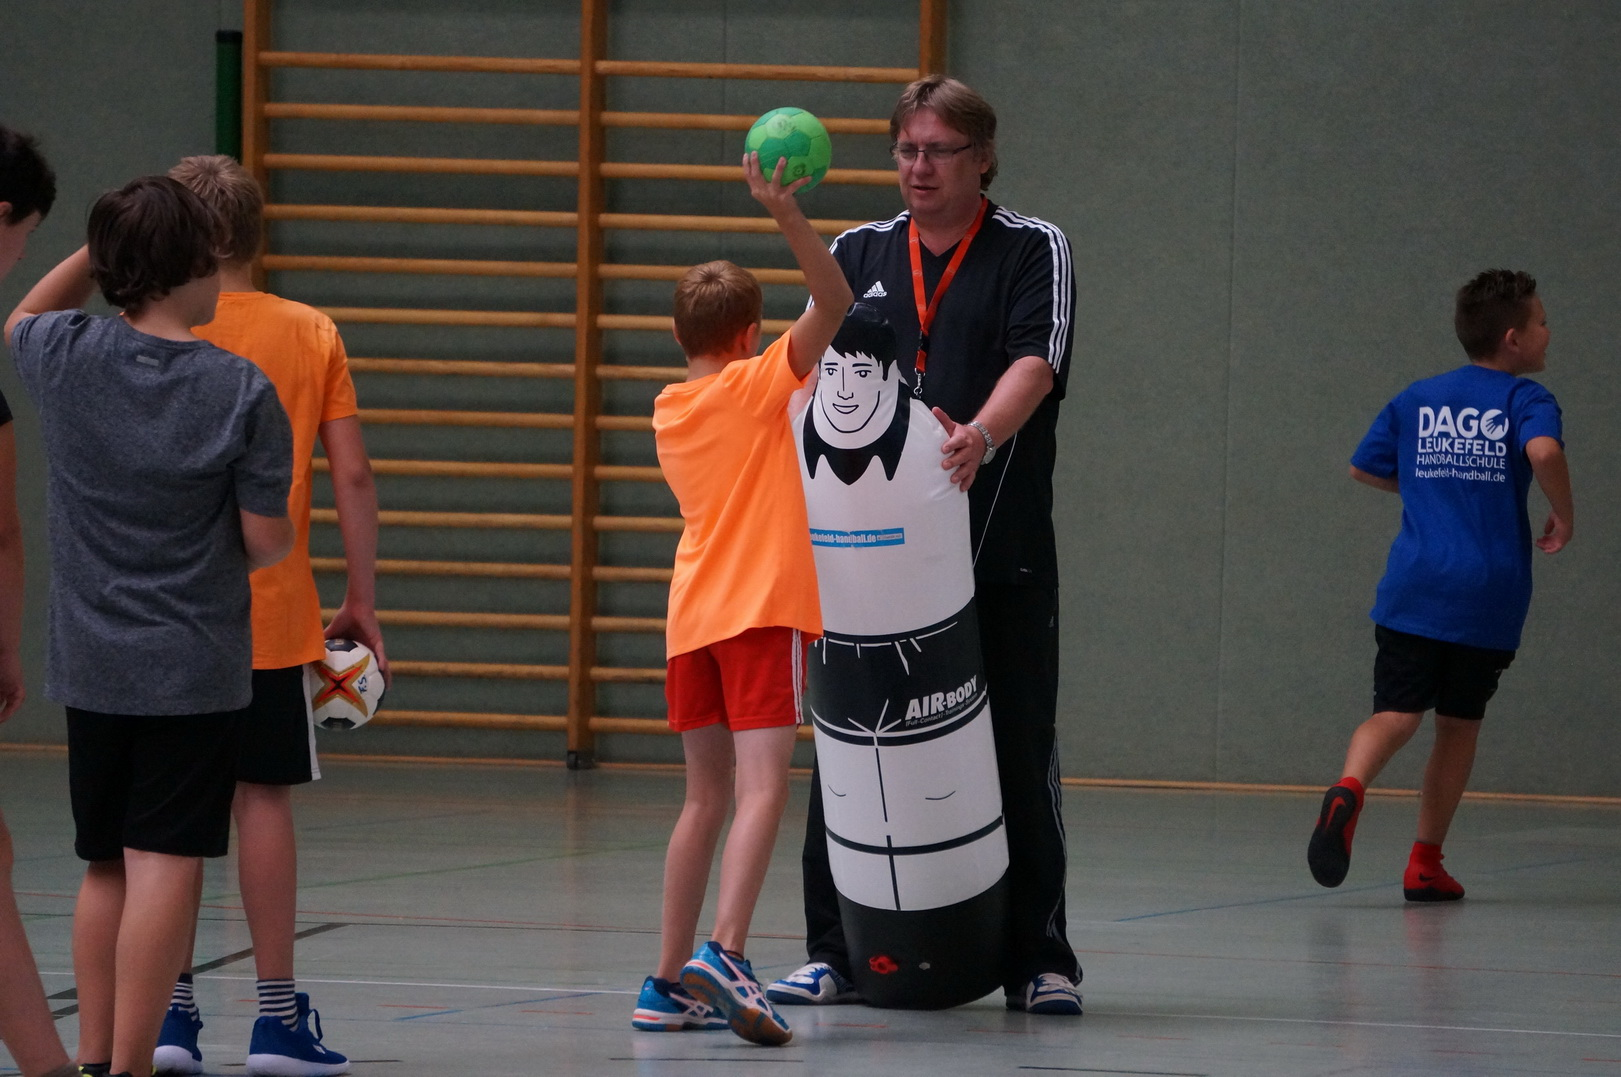 201808_Handballcamp_SDH_MG_224w